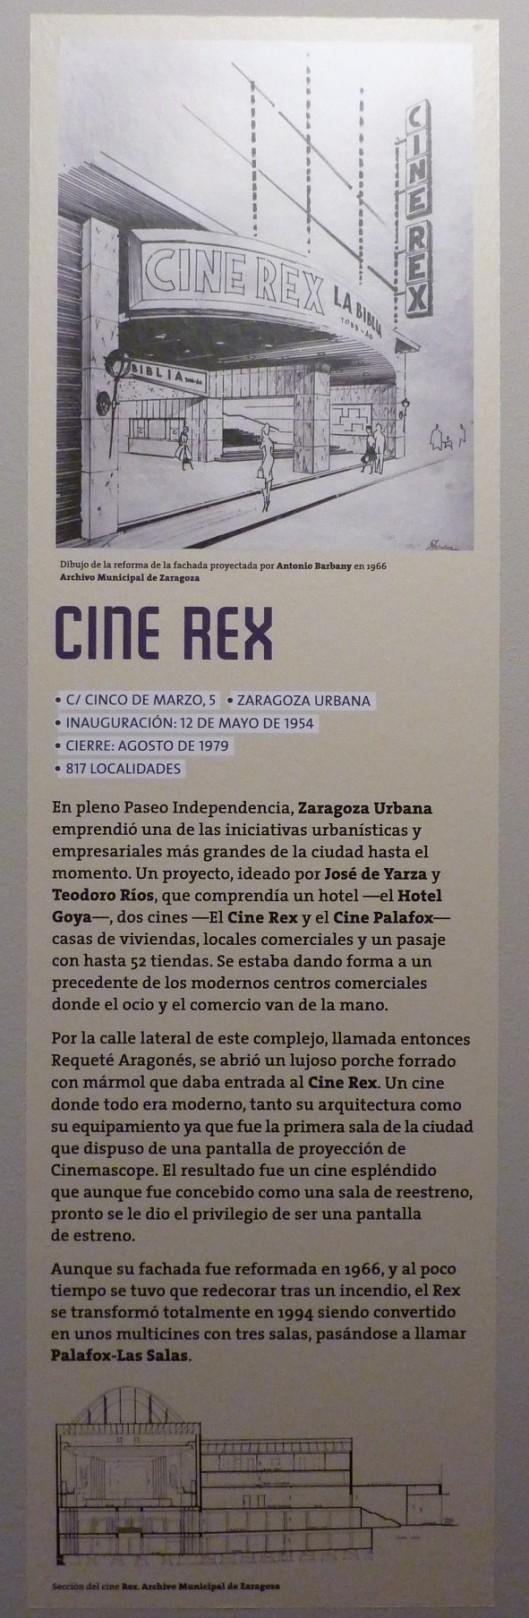 Cine Rex - Zaragoza Desaparecida